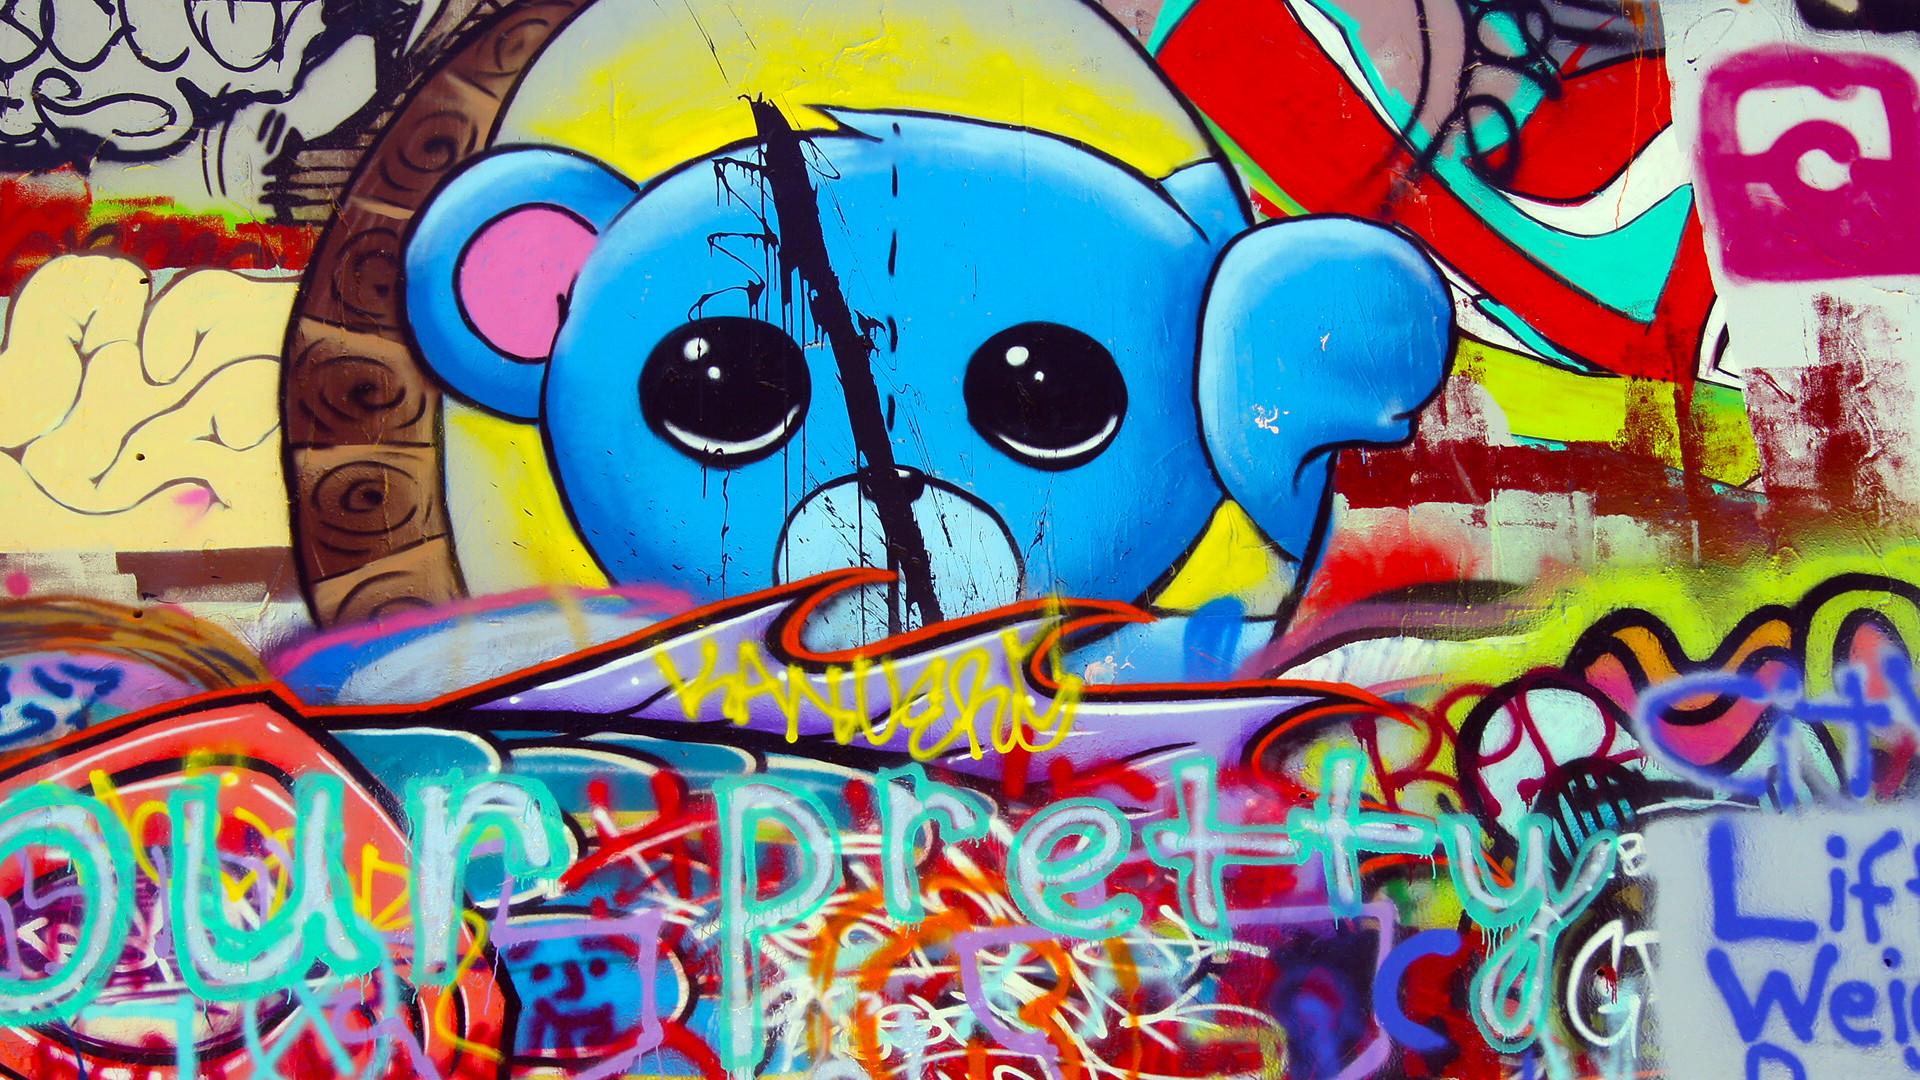 Nike Graffiti Wallpaper (55+ pictures)